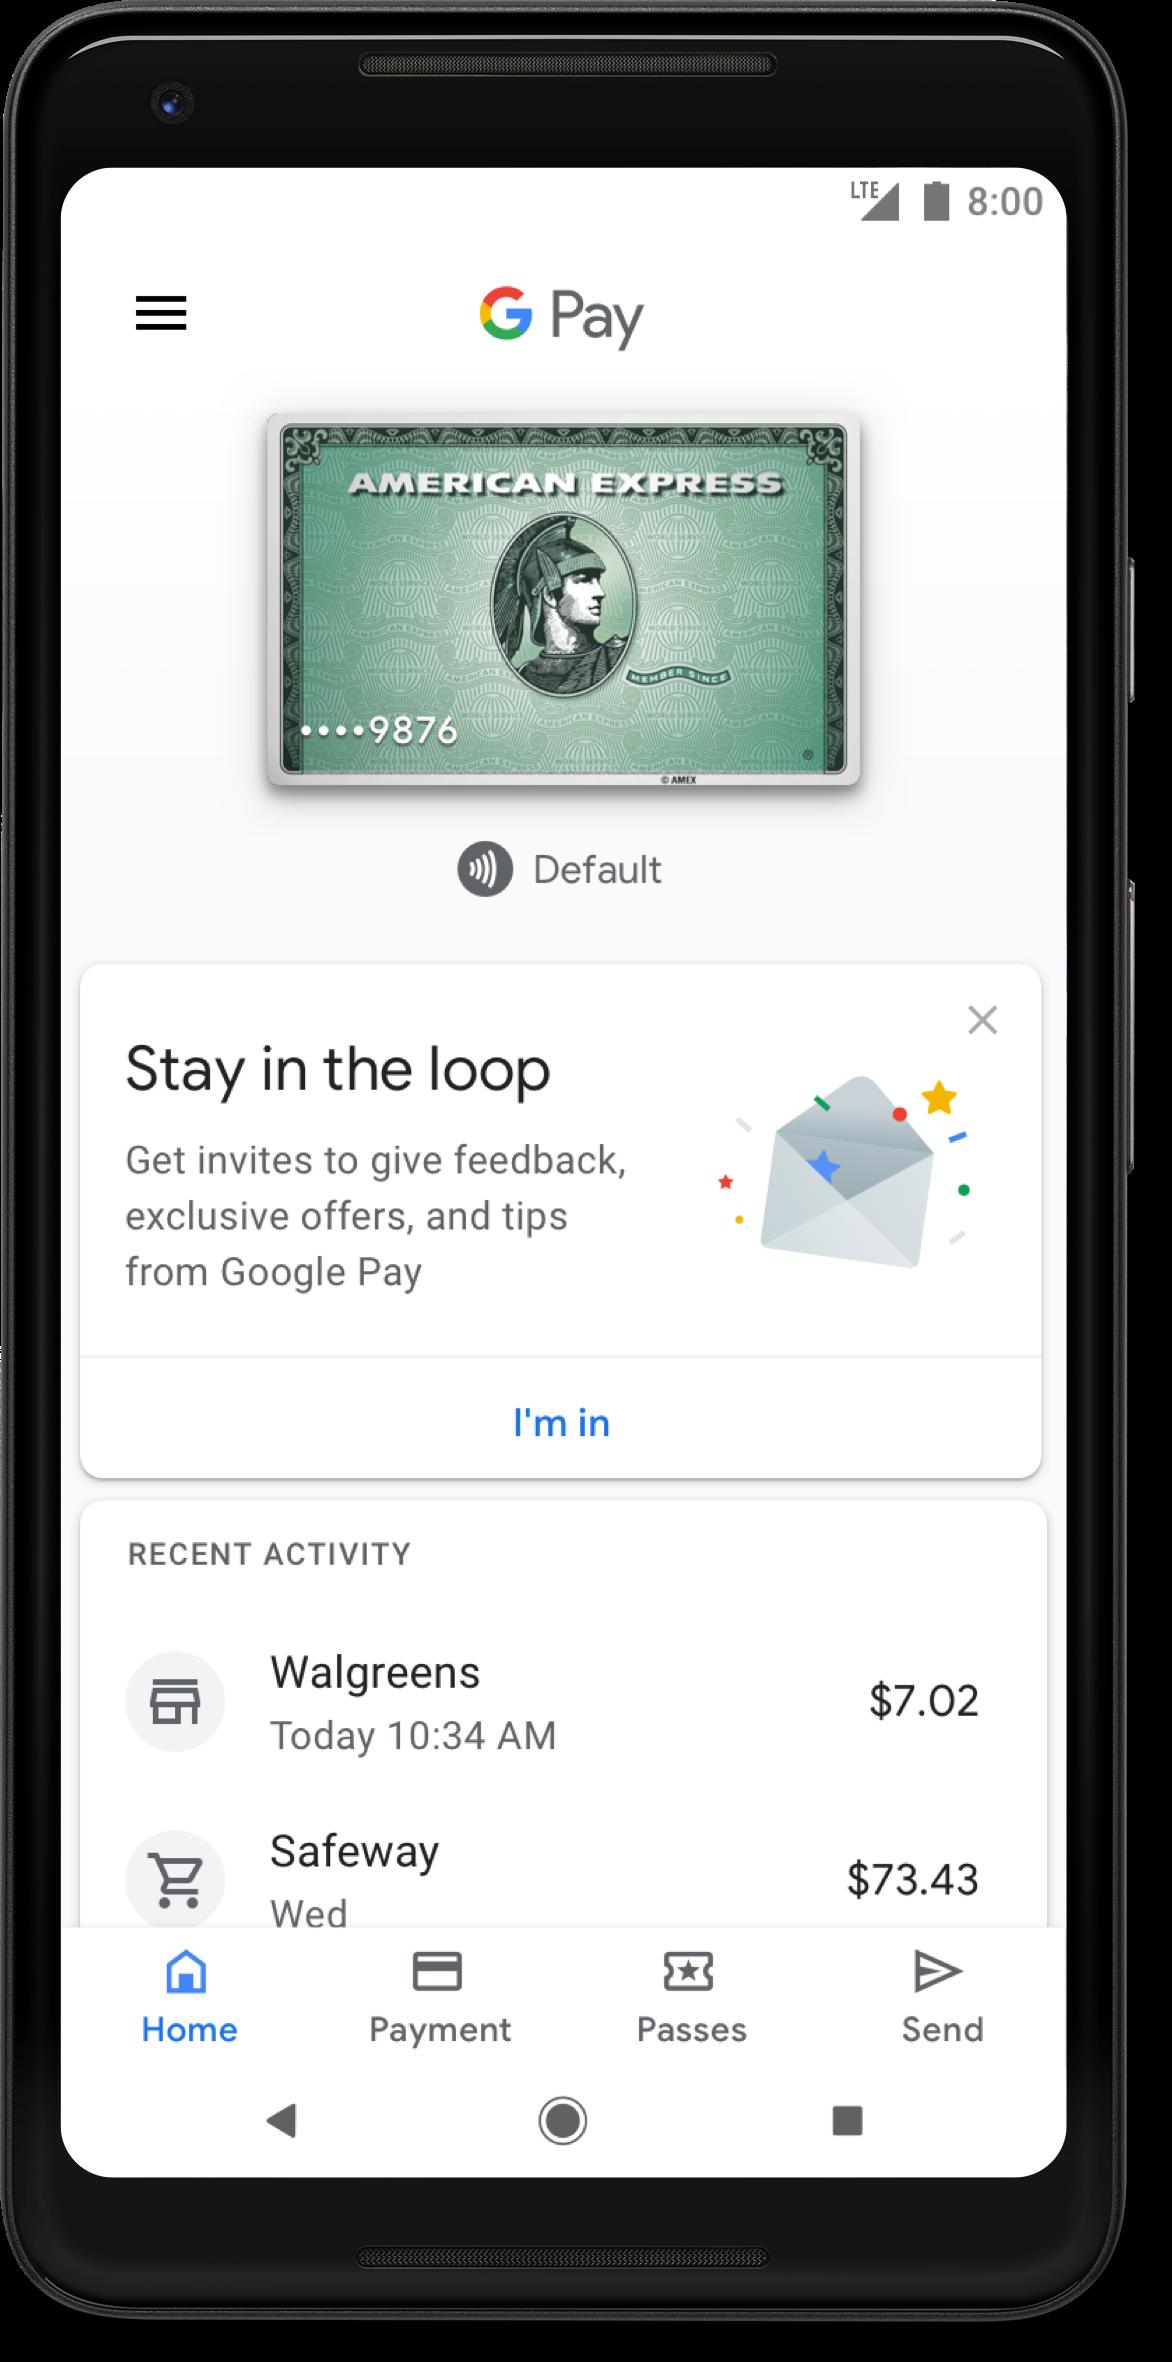 Google Pay app home screen